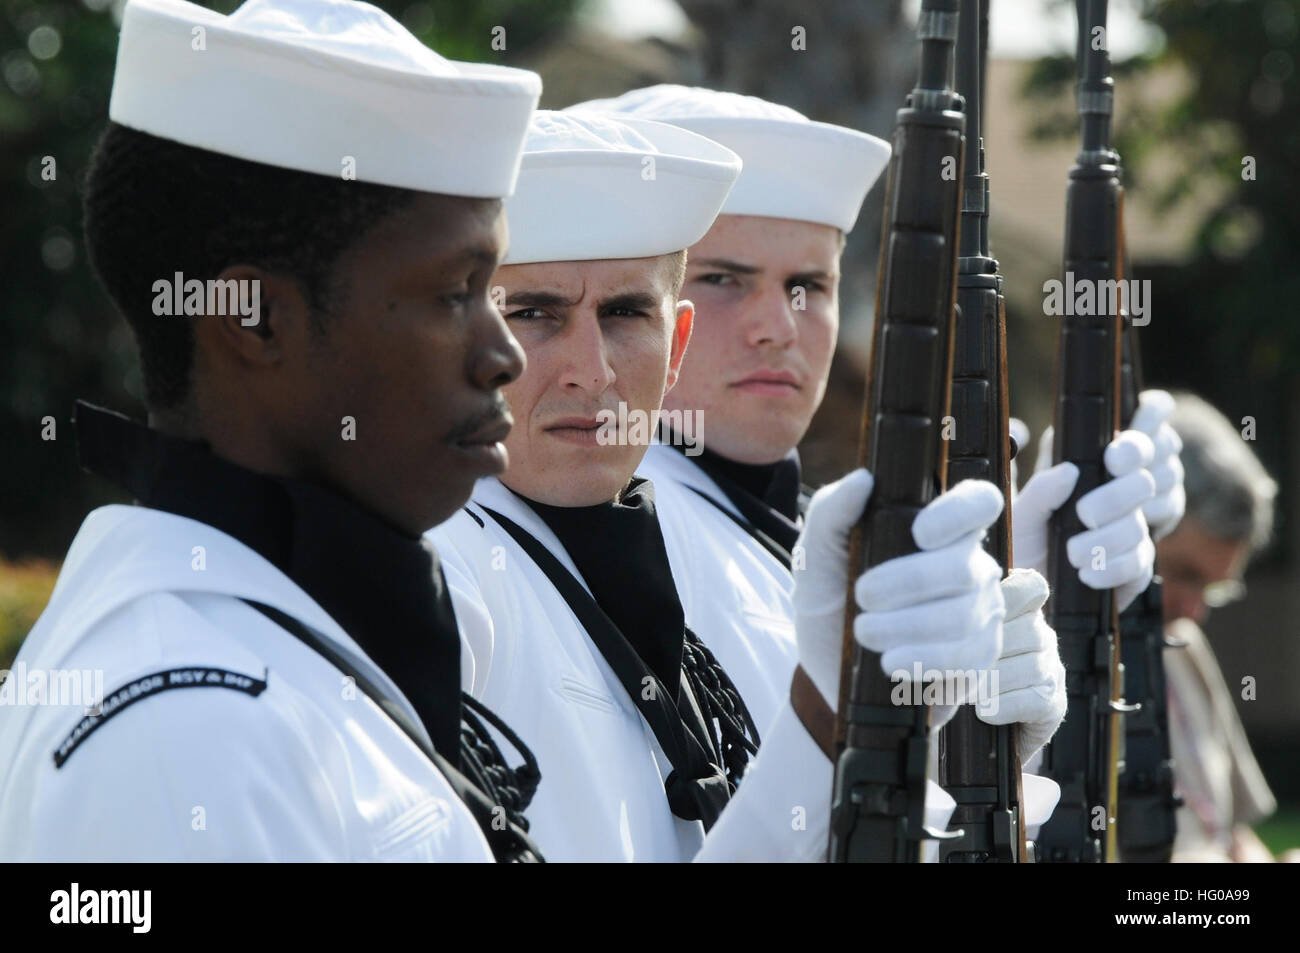 111205-N-WP746-056 JOINT BASE PEARL HARBOR-HICKAM (Dec. 5, 2011) Sailors assigned to Joint Base Pearl Harbor-Hickam - Stock Image